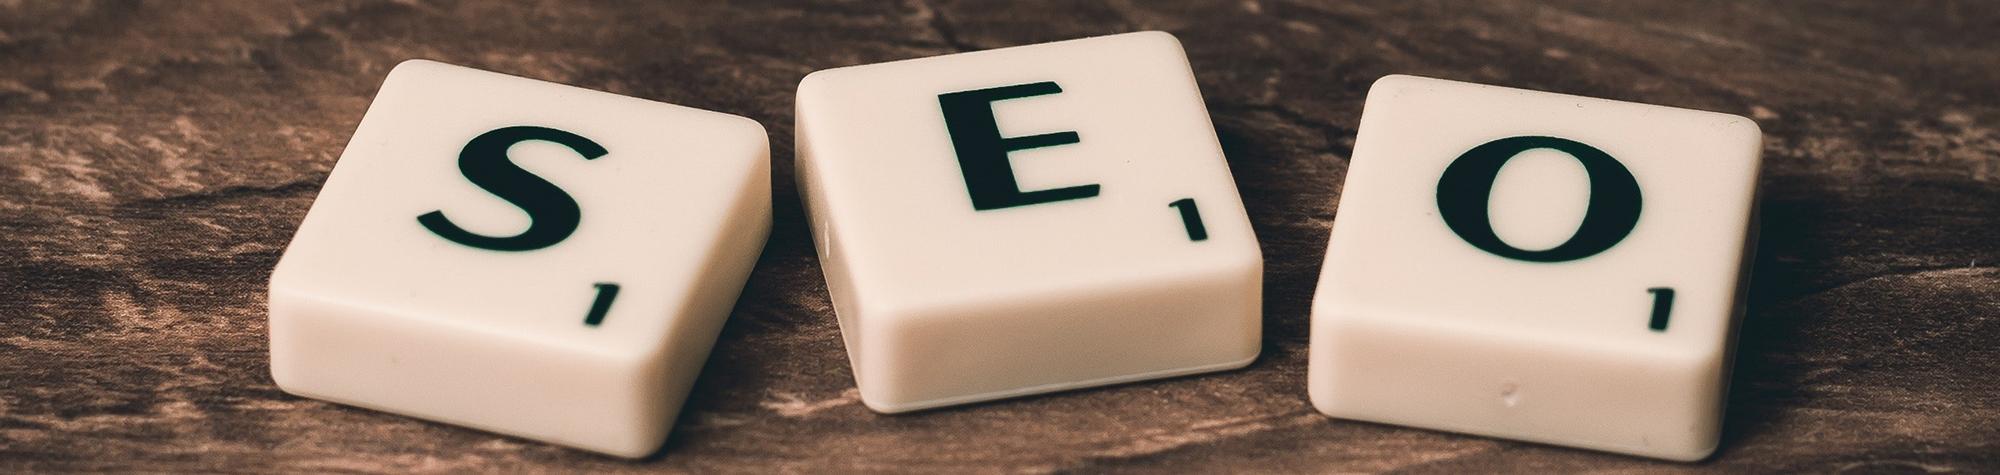 La importancia del SEO en marketing digital